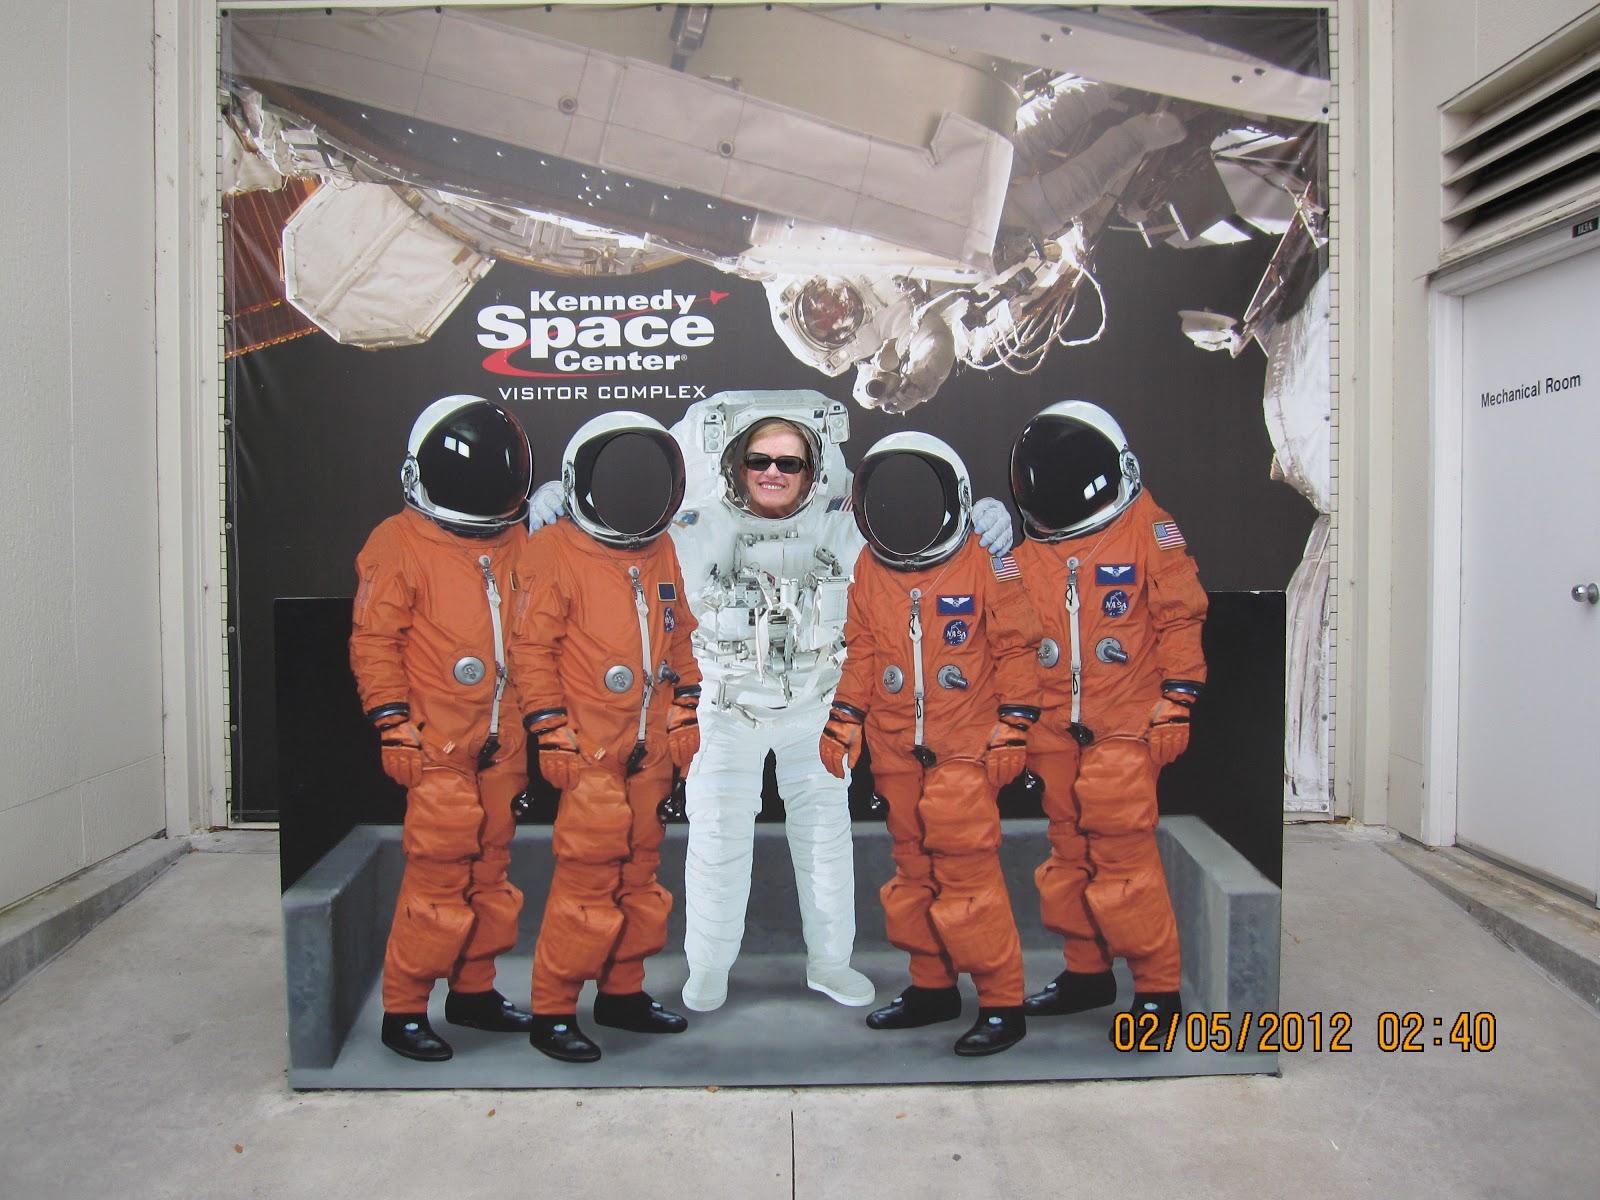 challenger astronauts survived - photo #23